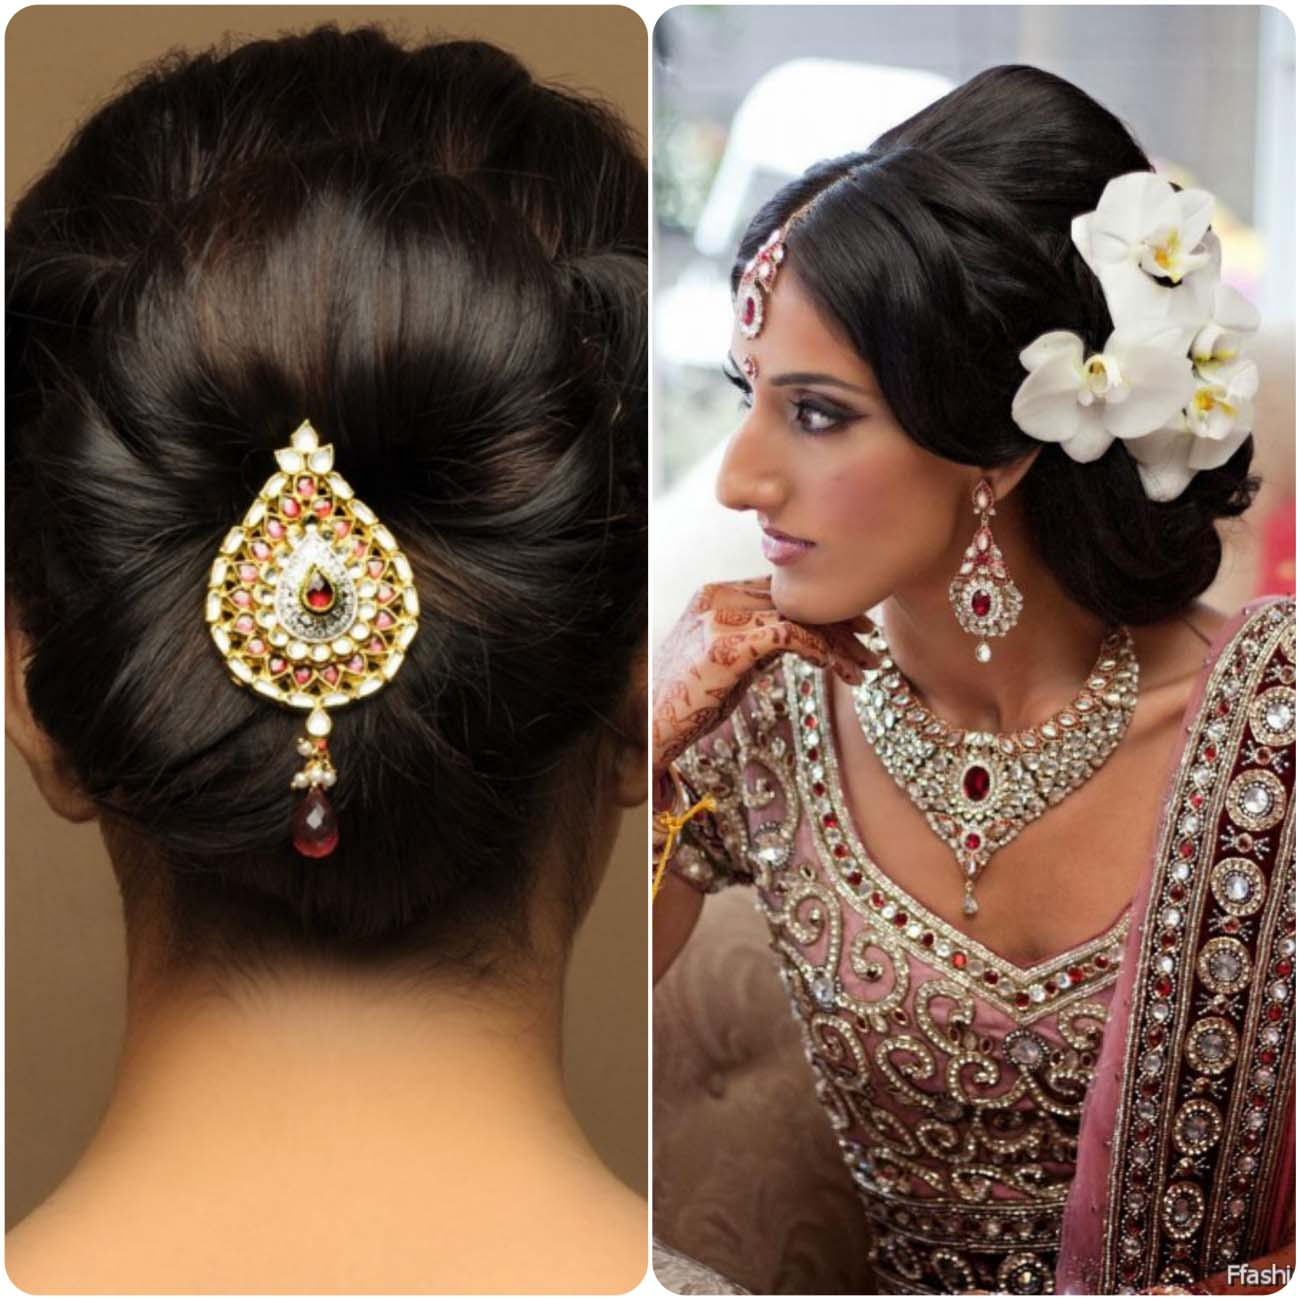 Women Fashion Girls Dress Indian Native Wedding Hair